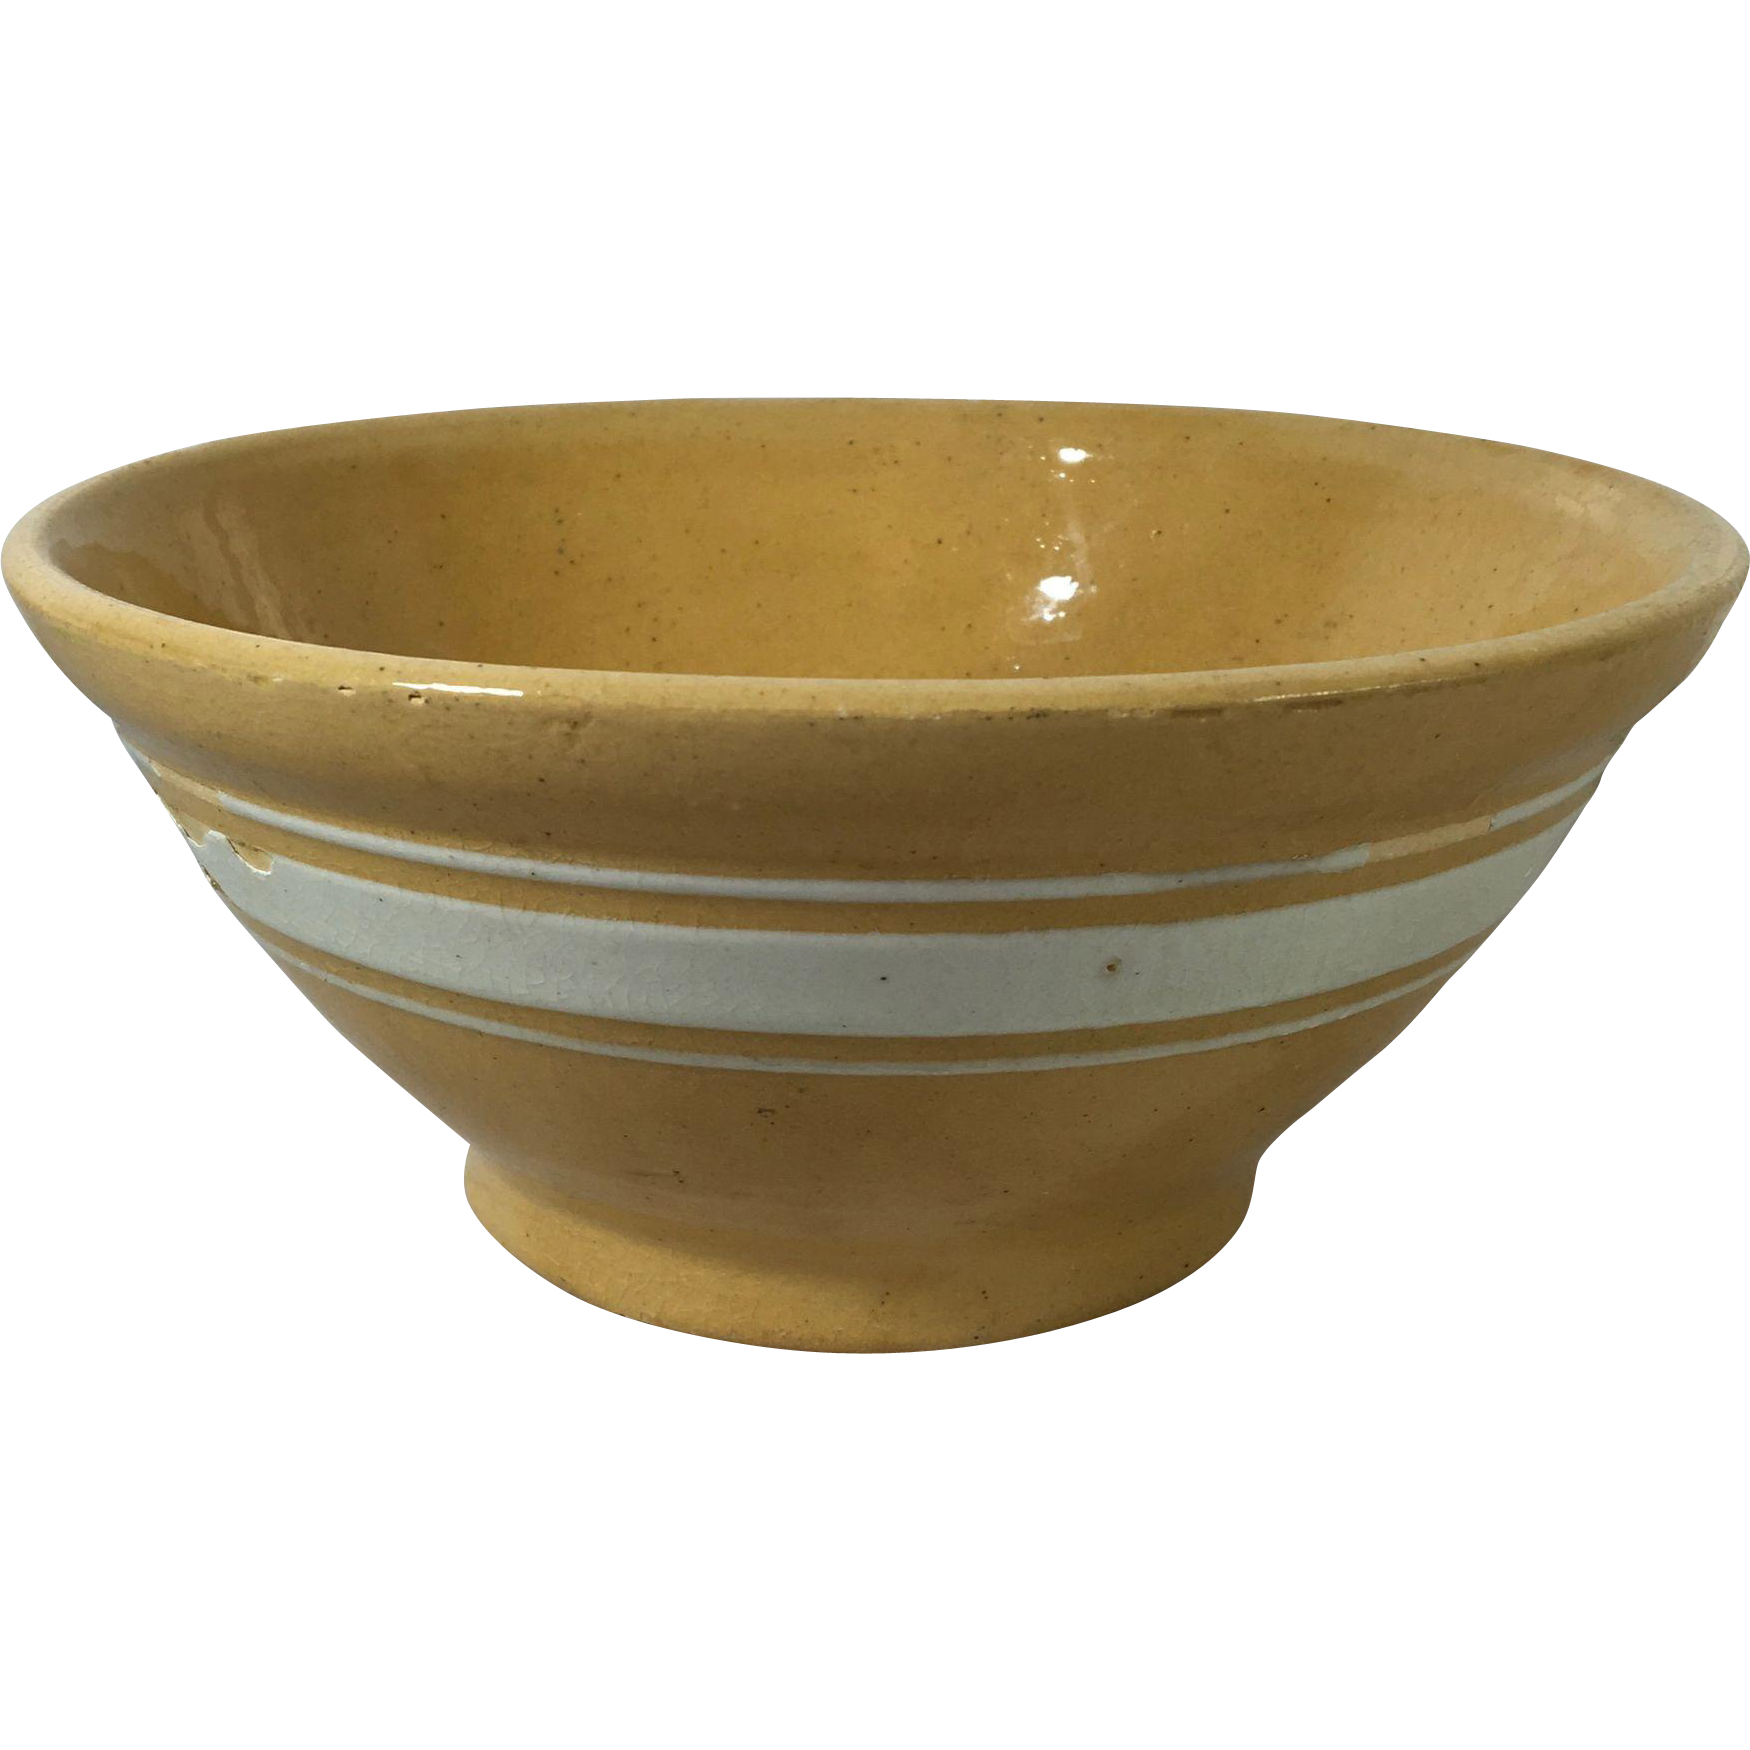 1930 American Yellow Ware Bowl